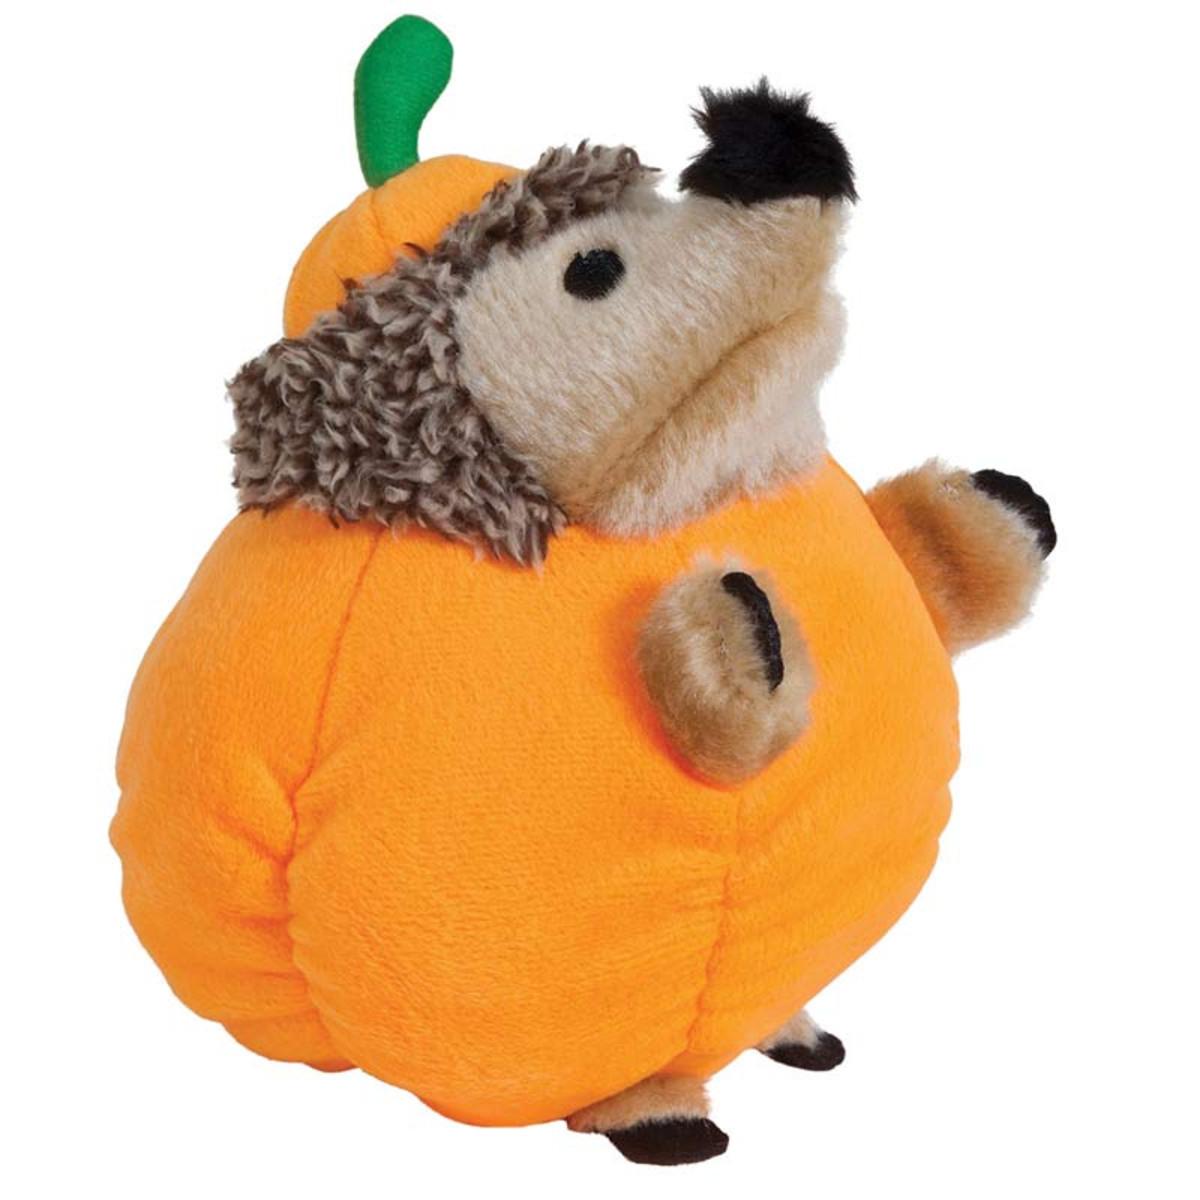 Petmate Fall Heggie - Pumpkin Dog Toy